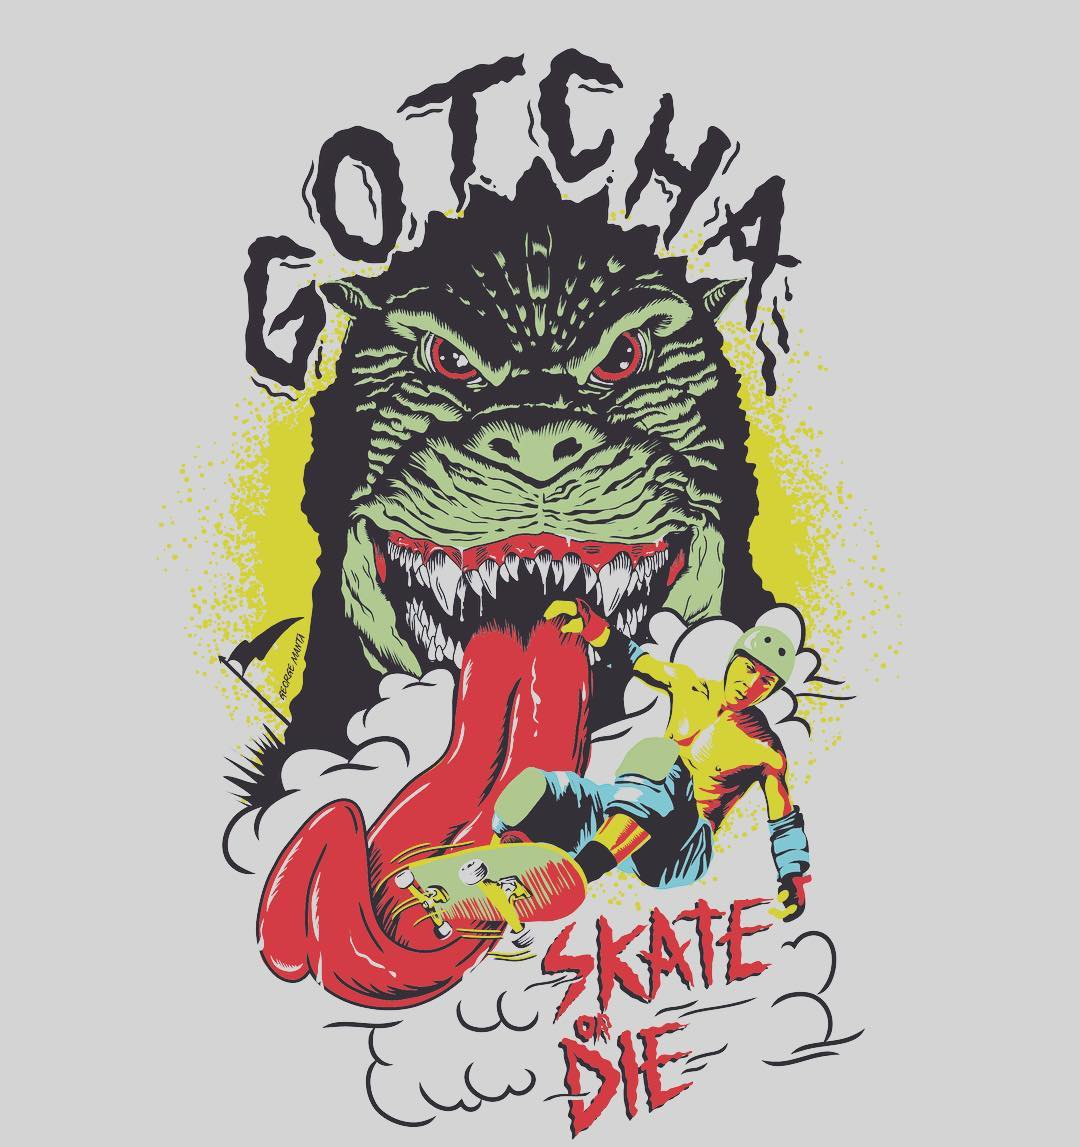 Skate or Die #gotcha // since 1978, LagunaBeach, CA.